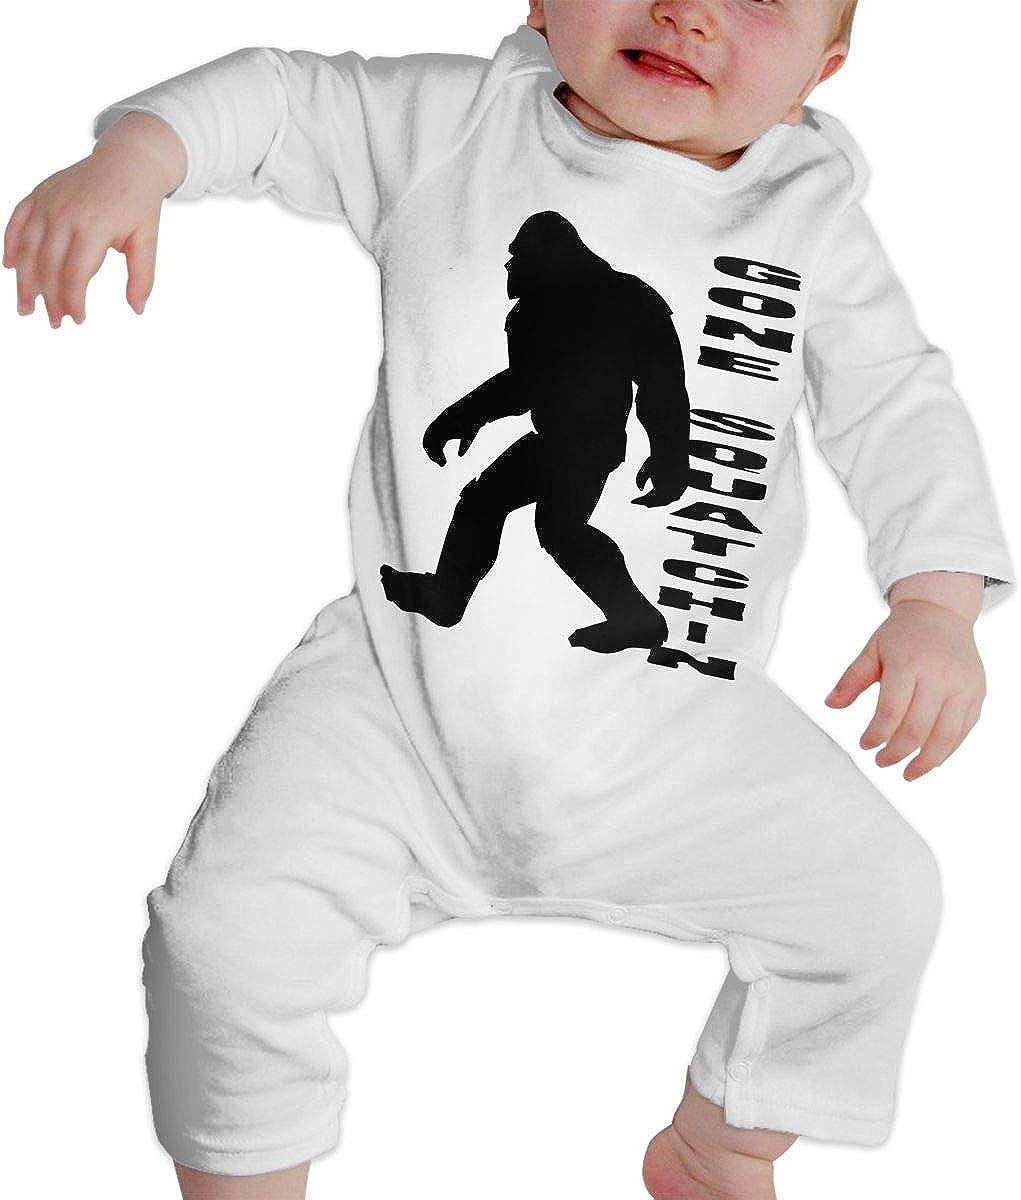 YELTY6F Gone Squatchin Bigfoot Sasquatch Squatch Printed Newborn Infant Baby Boy Girl Bodysuit Long Sleeve Outfits White